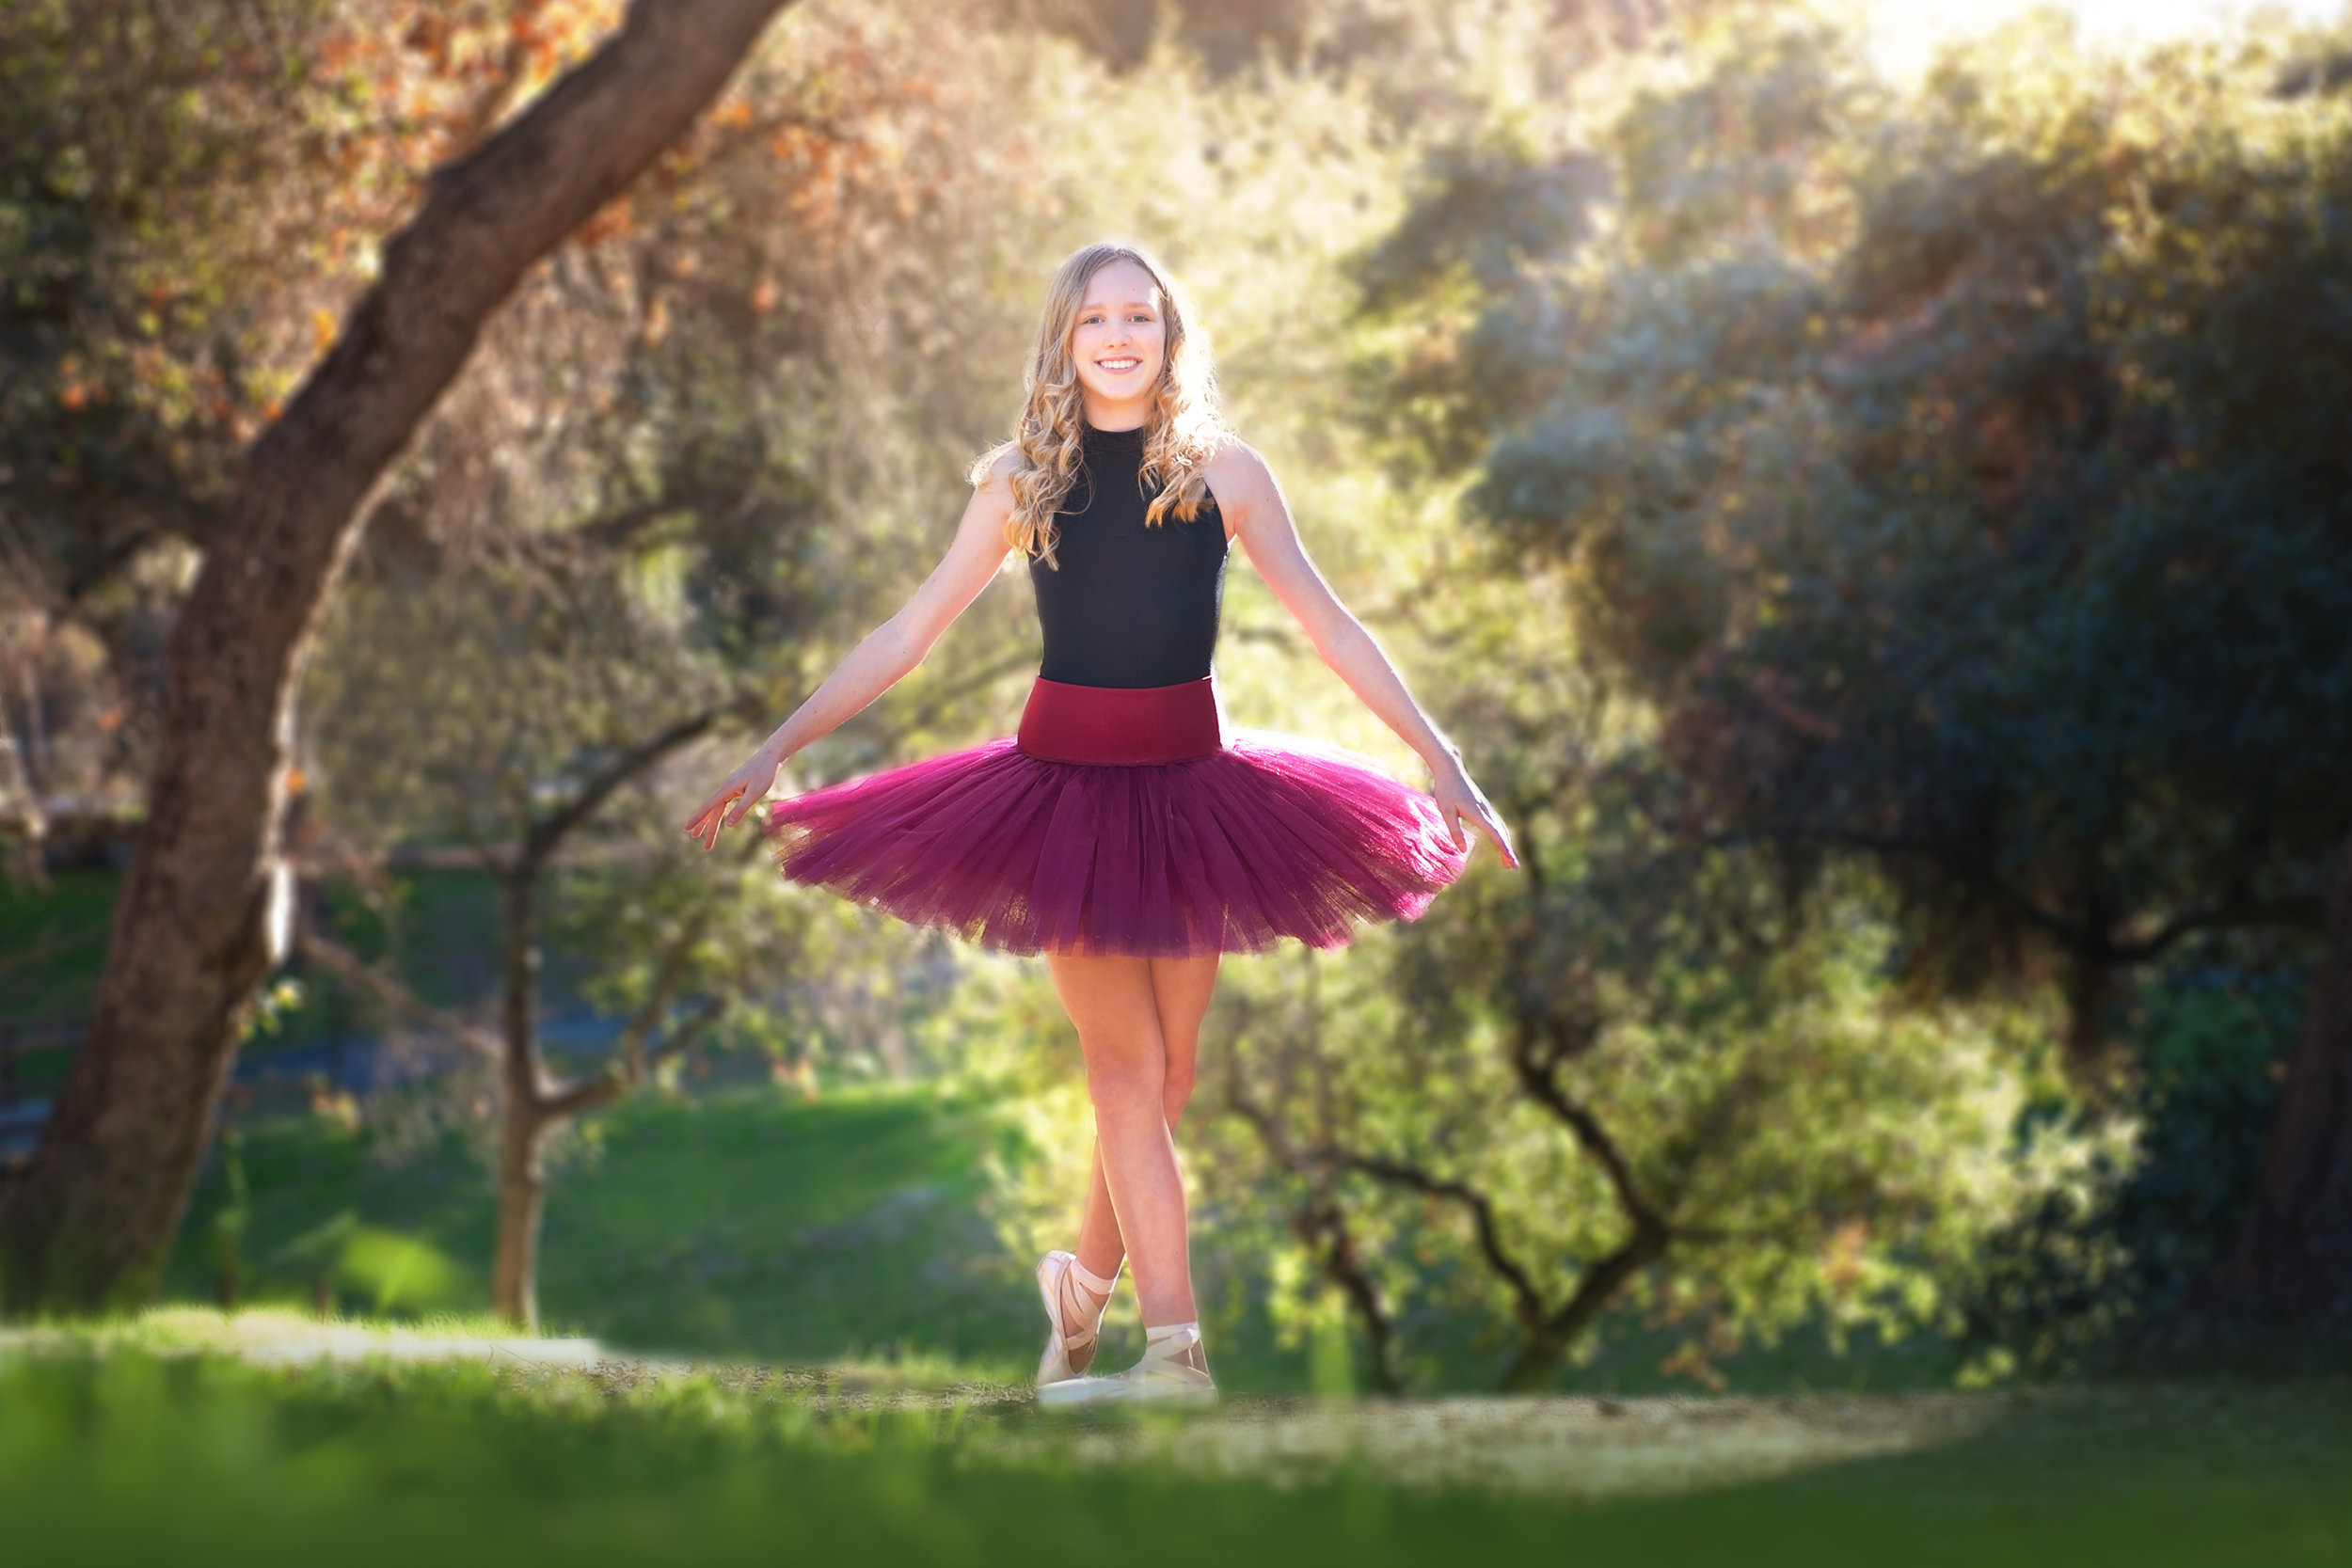 ballet-dancer-park-orange county-